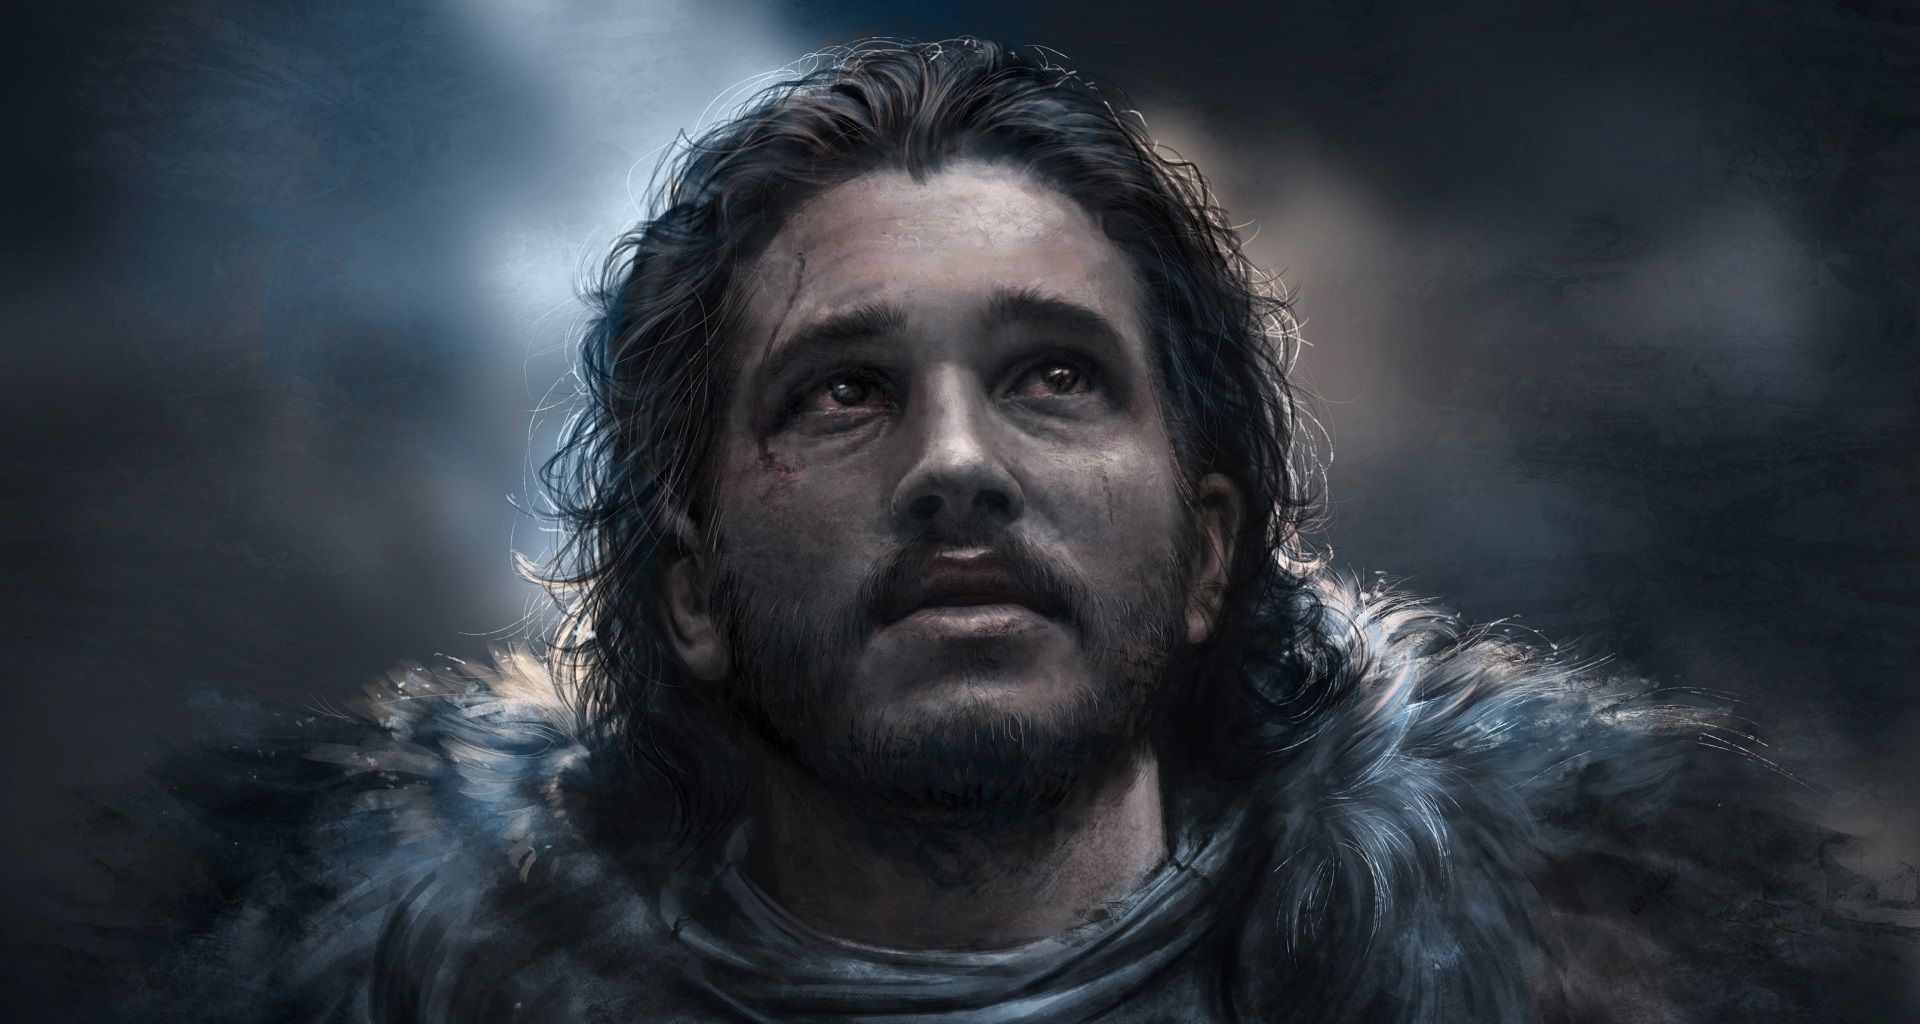 1920x1024 Jon Snow Hd Best Wallpaper For Desktop Jon Snow John Snow